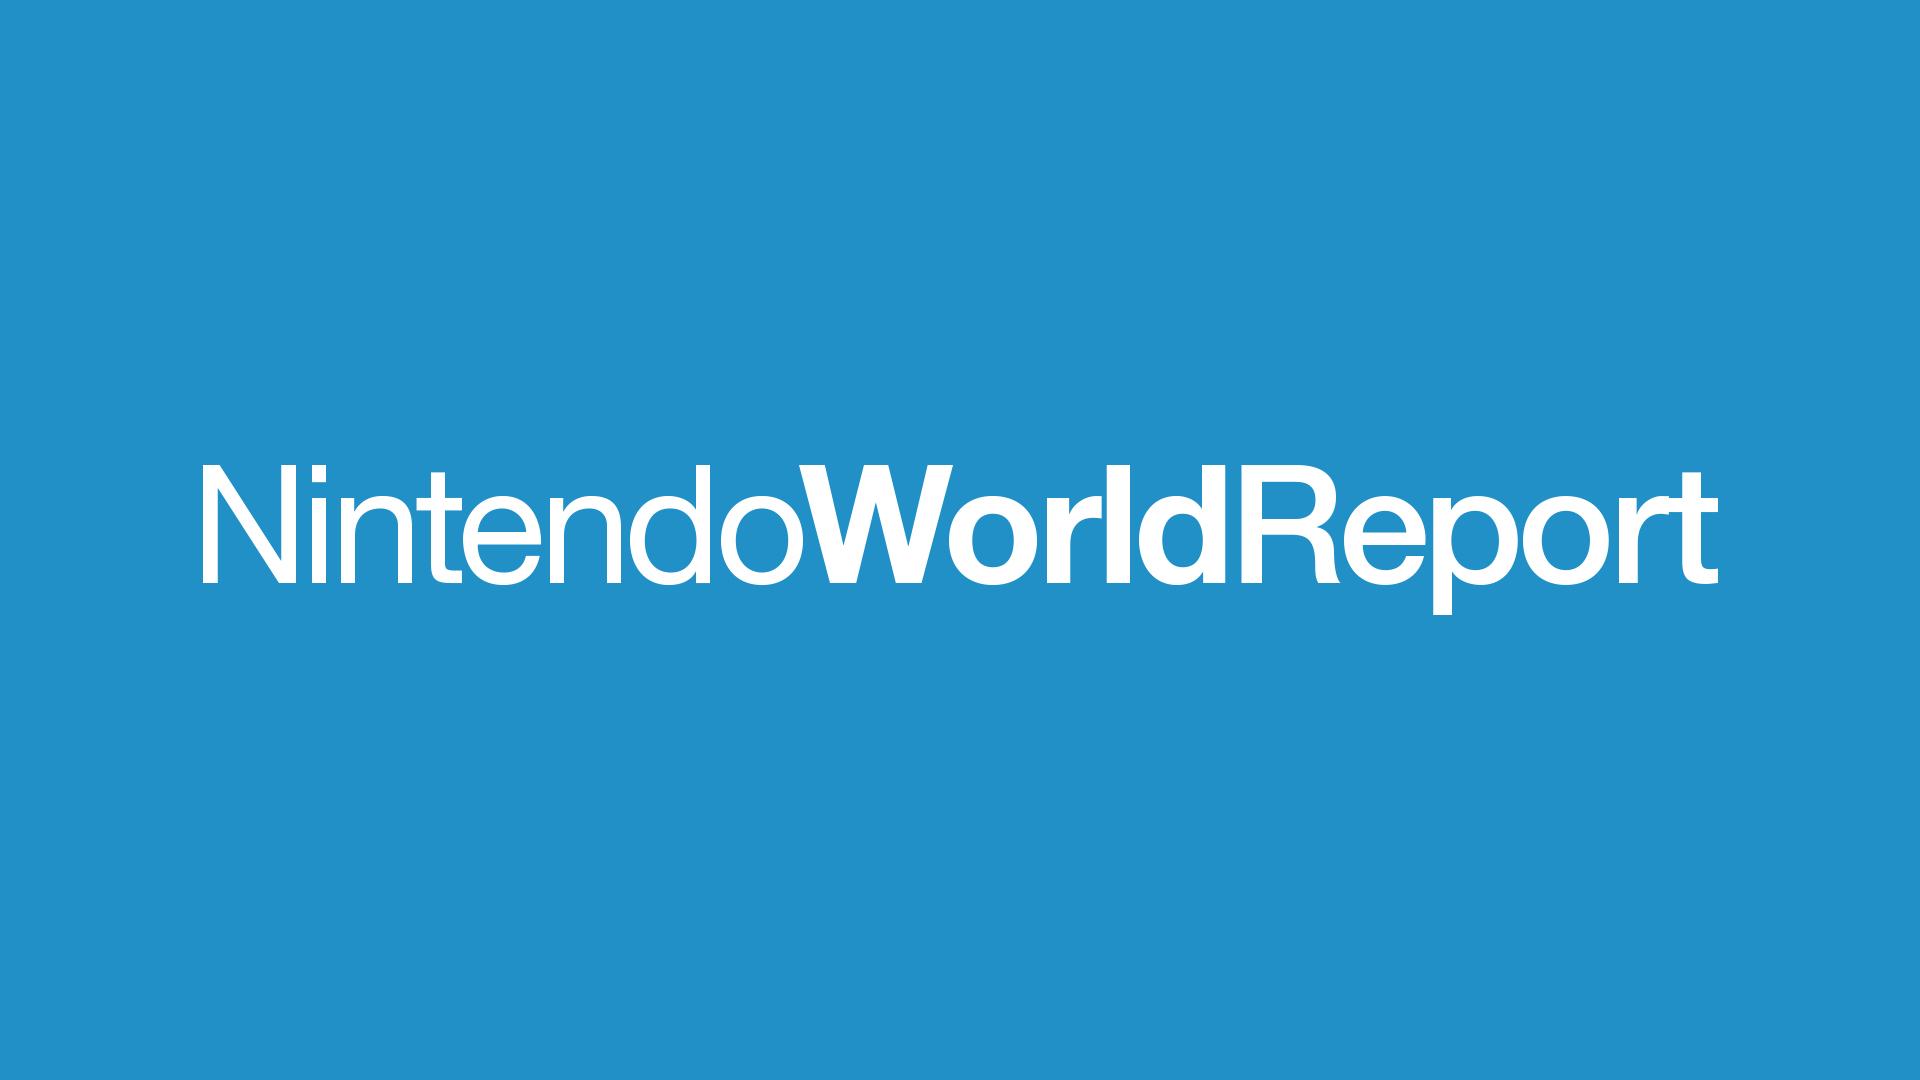 NintendoWorldReport-logo